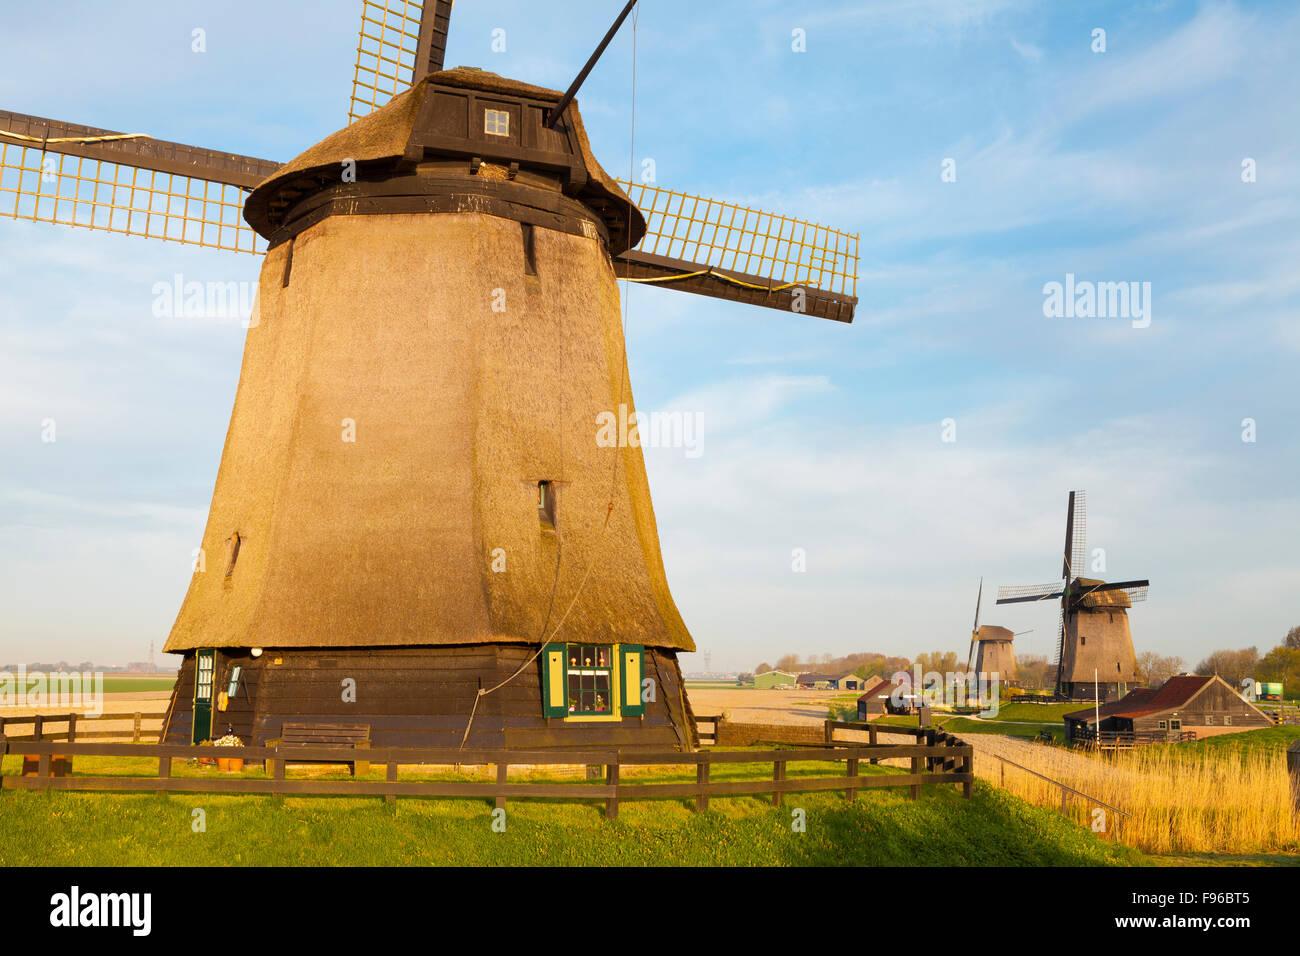 Windmills, Schermerhorn, North Holland, Netherlands - Stock Image